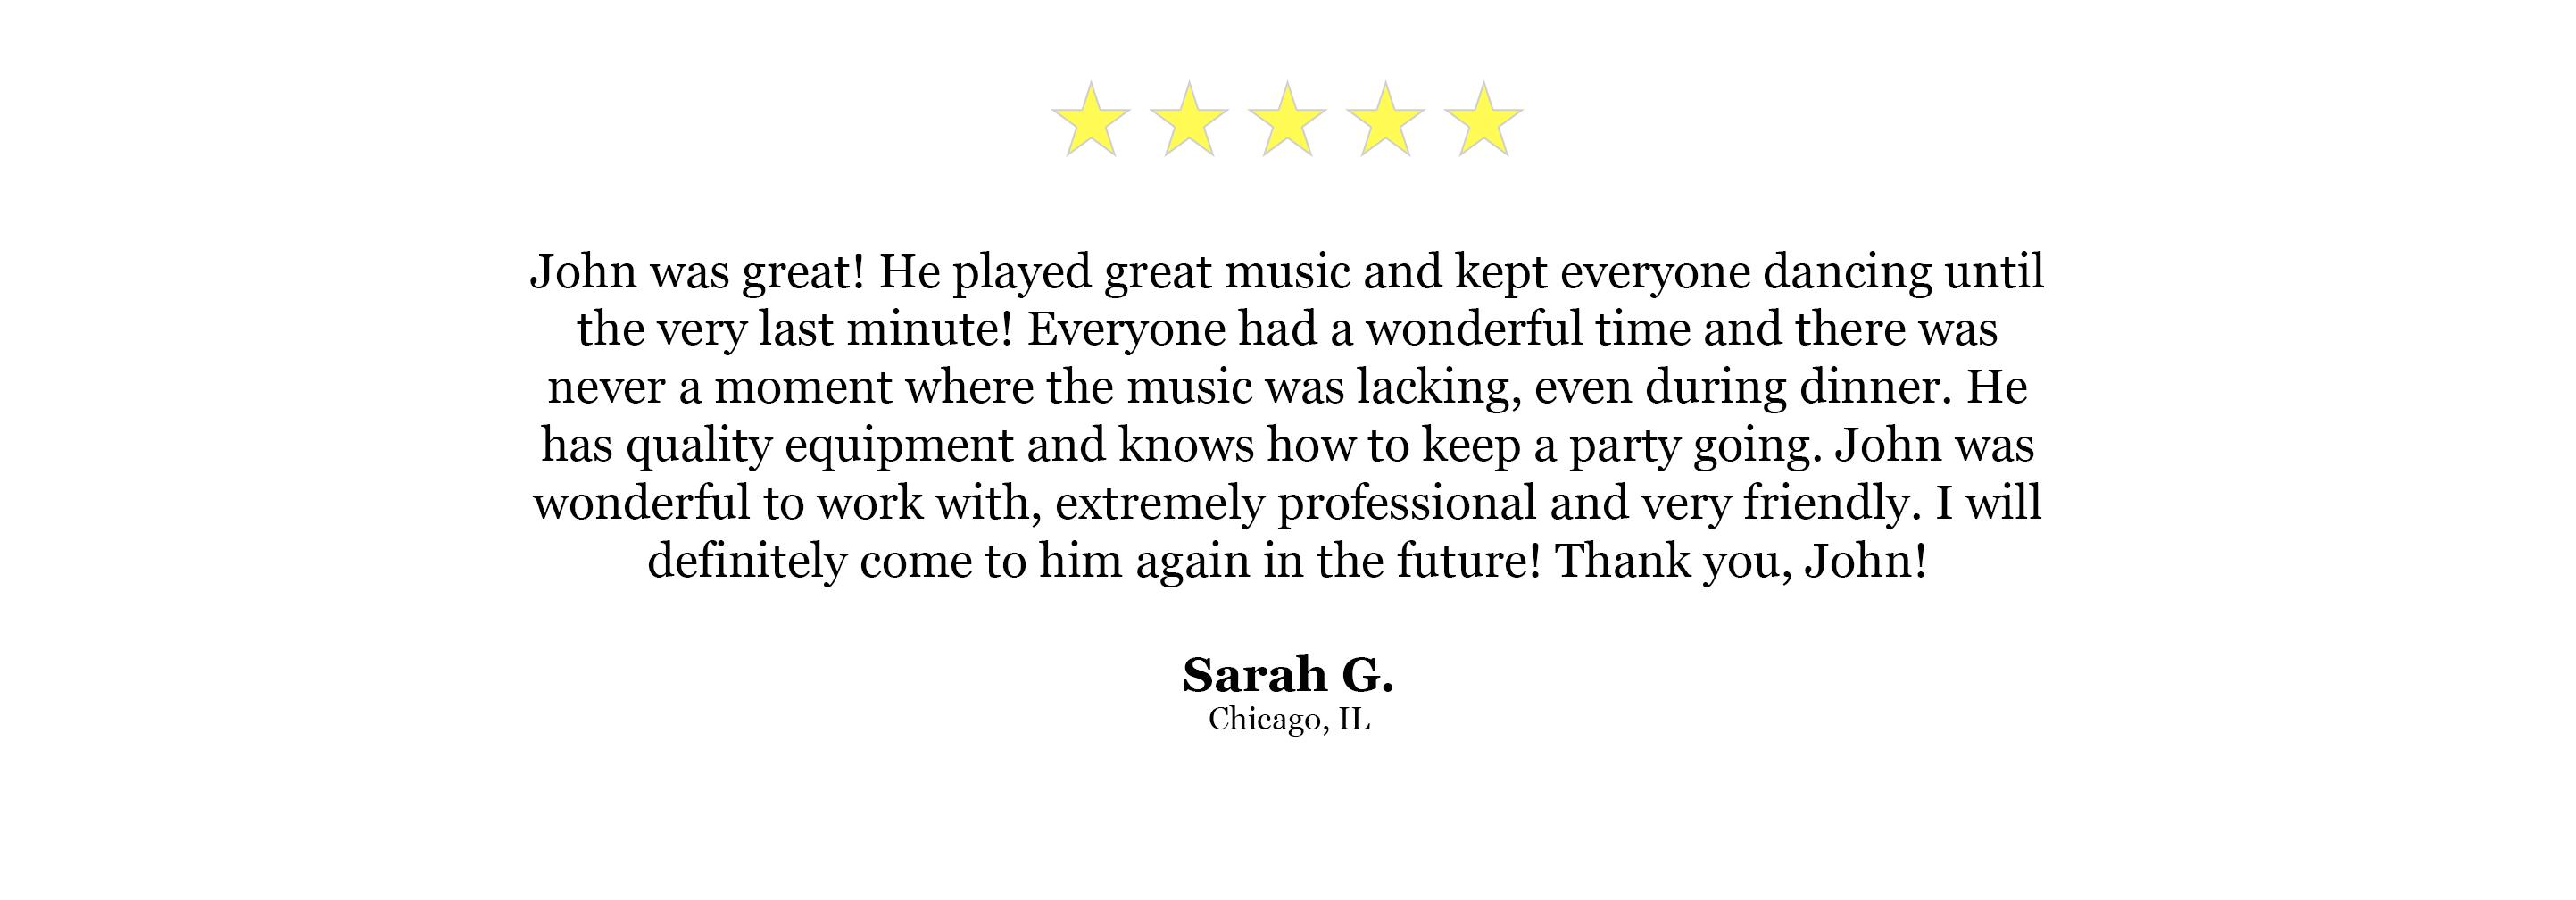 DJ Website Quote - Sarah G